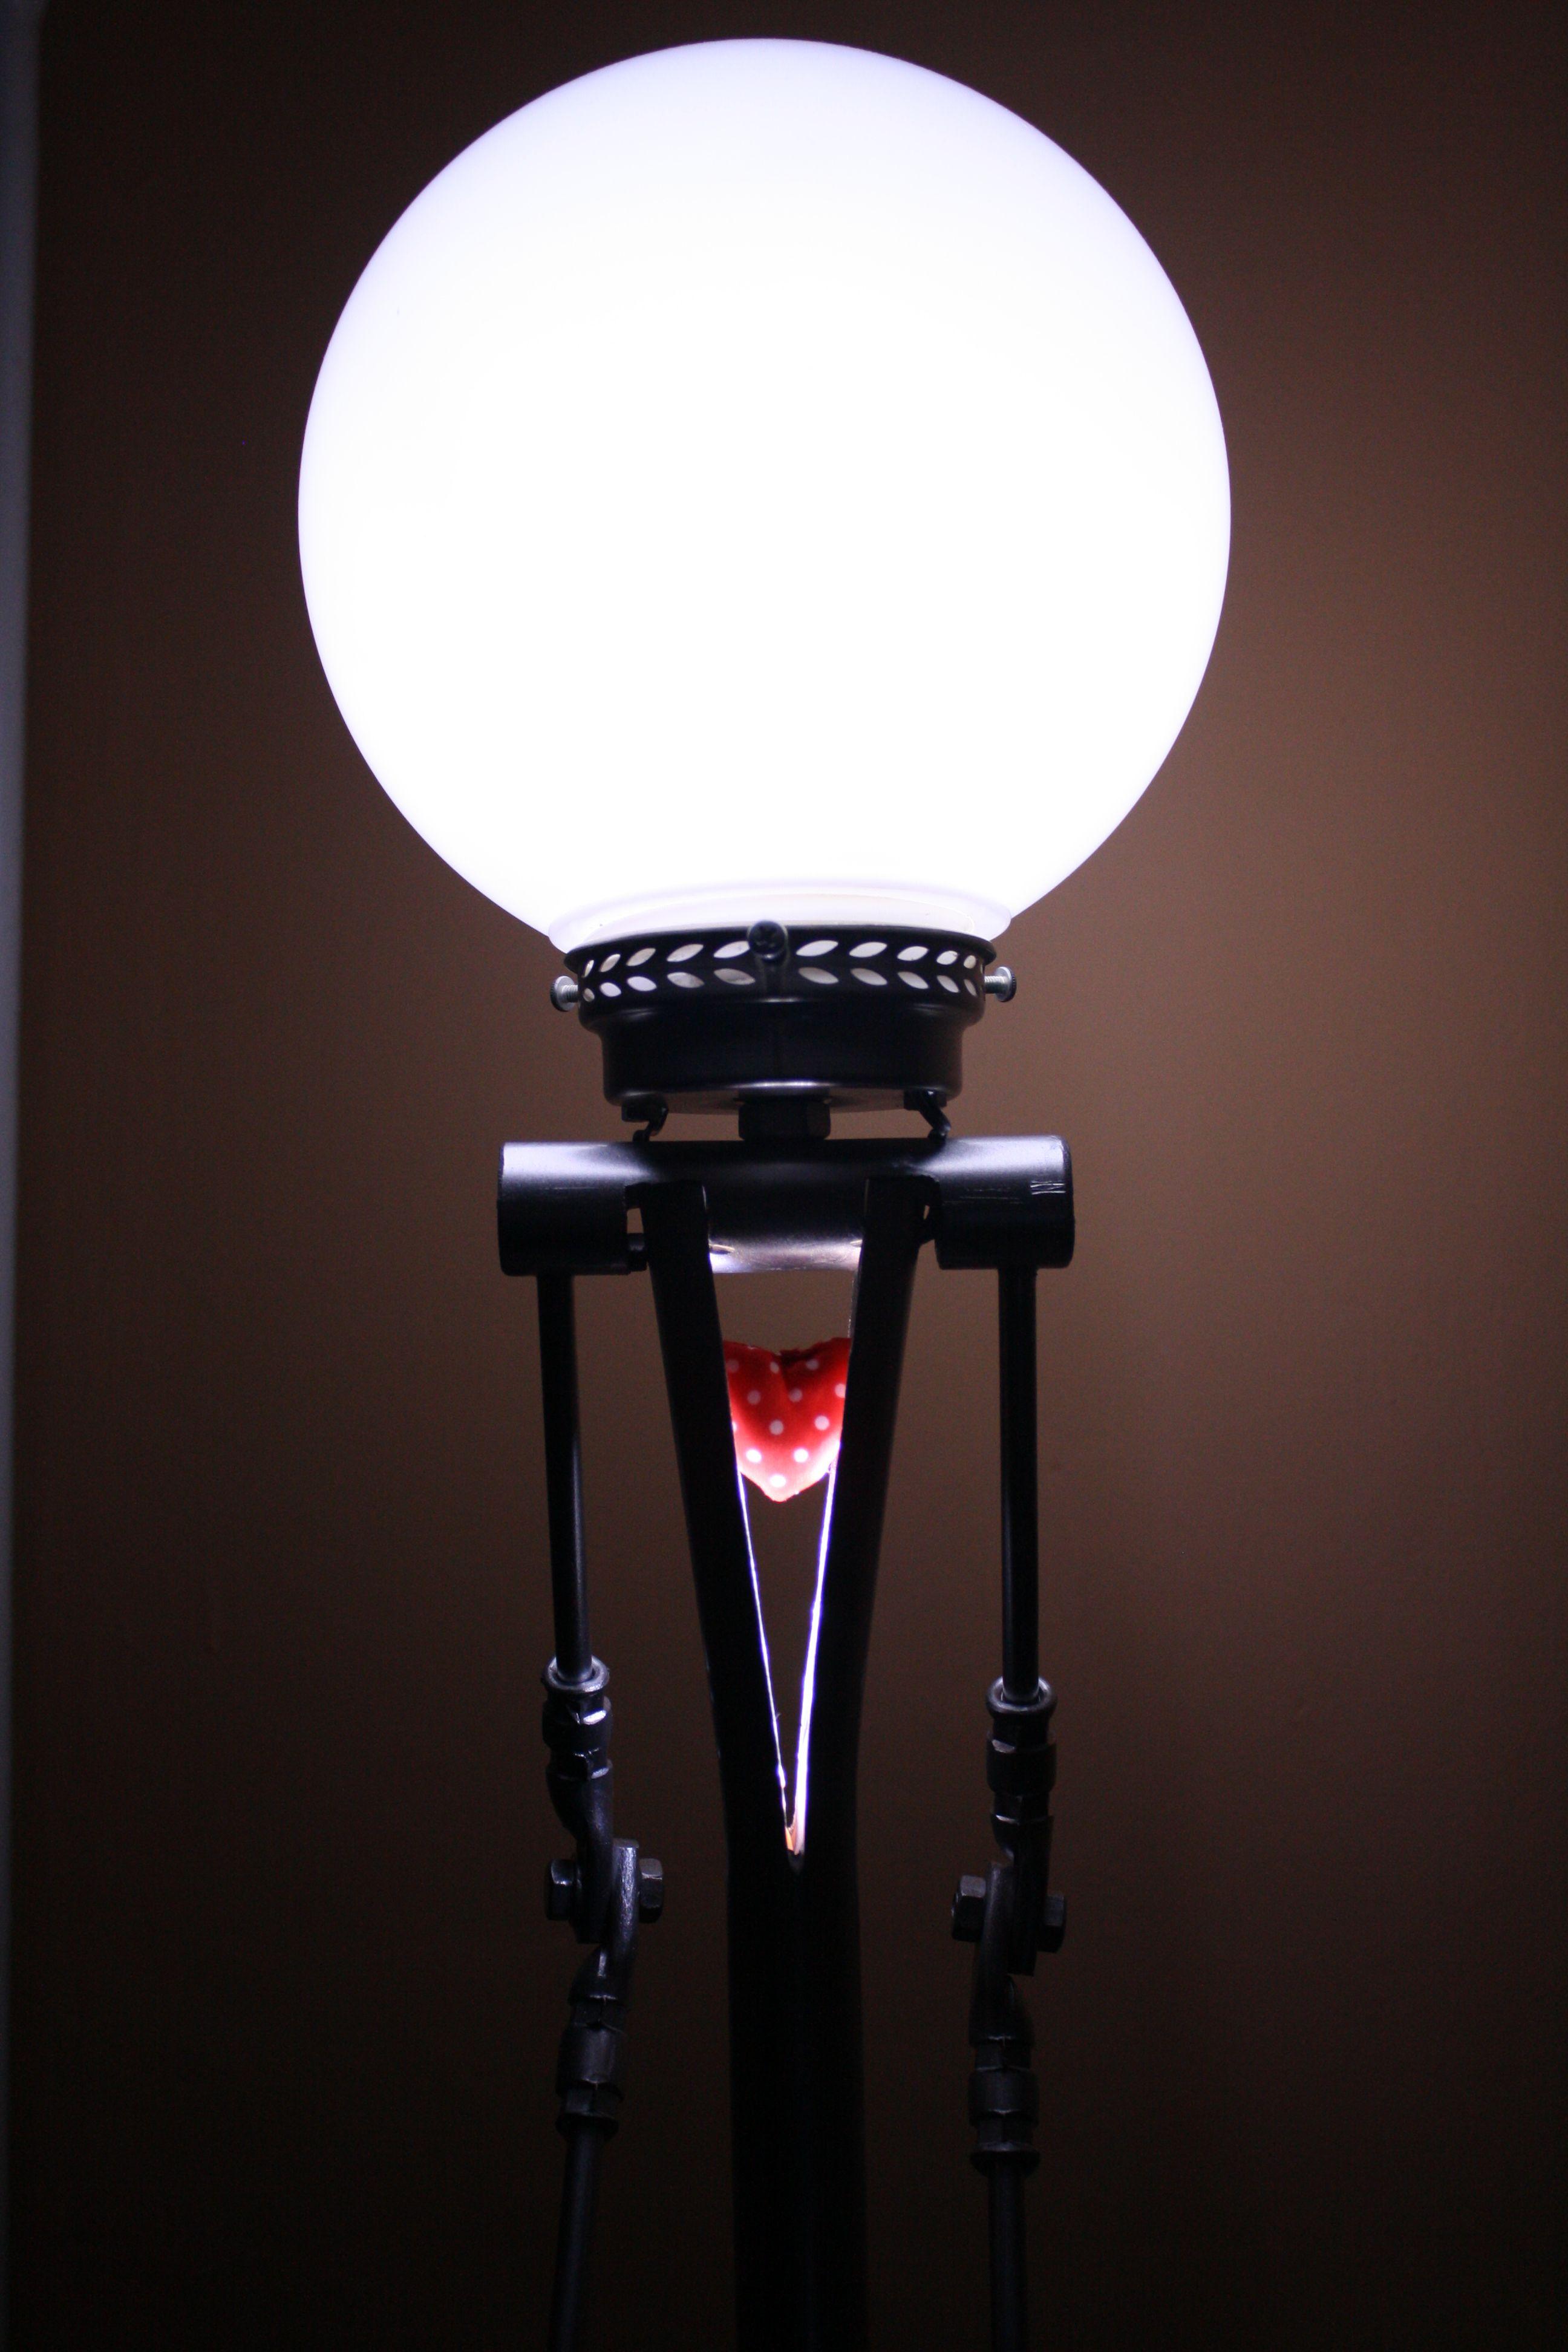 The secret life of lights